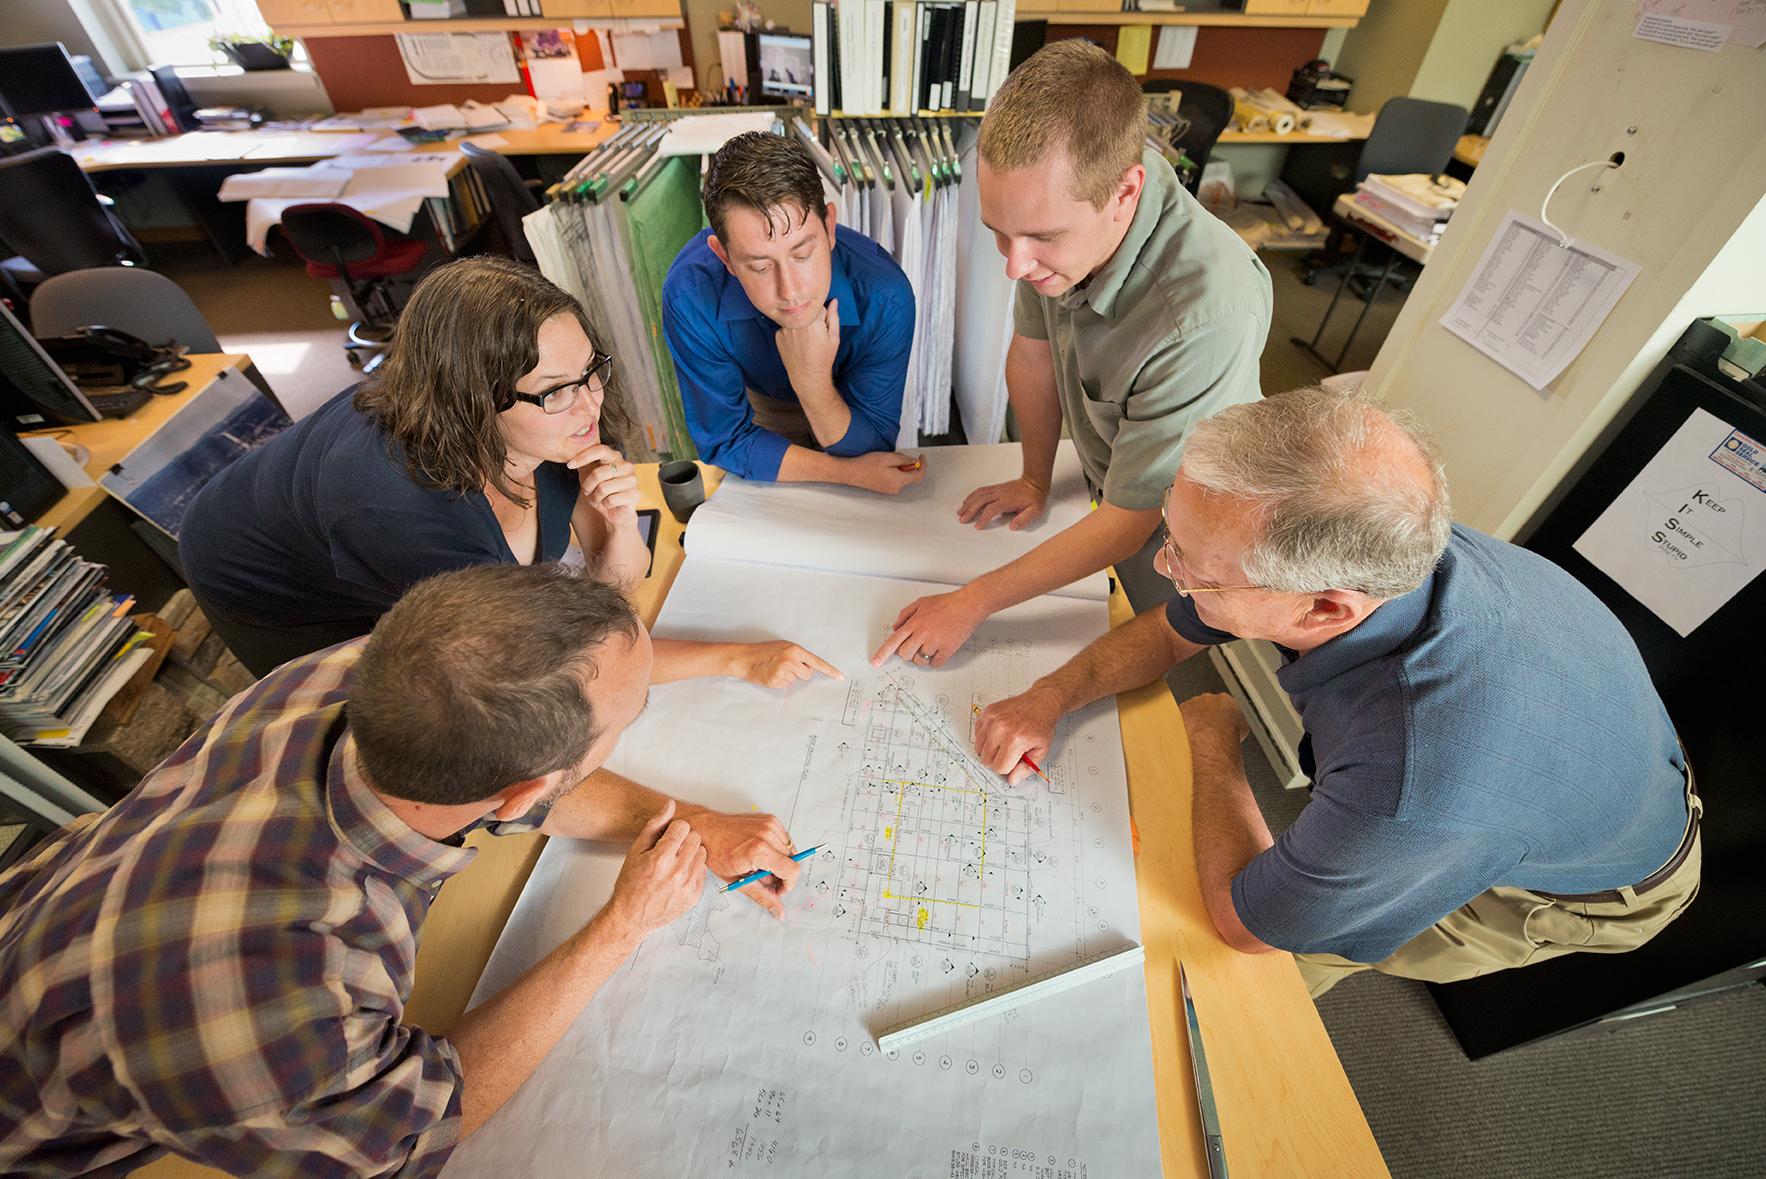 spokane-architectural-photographer-engineering